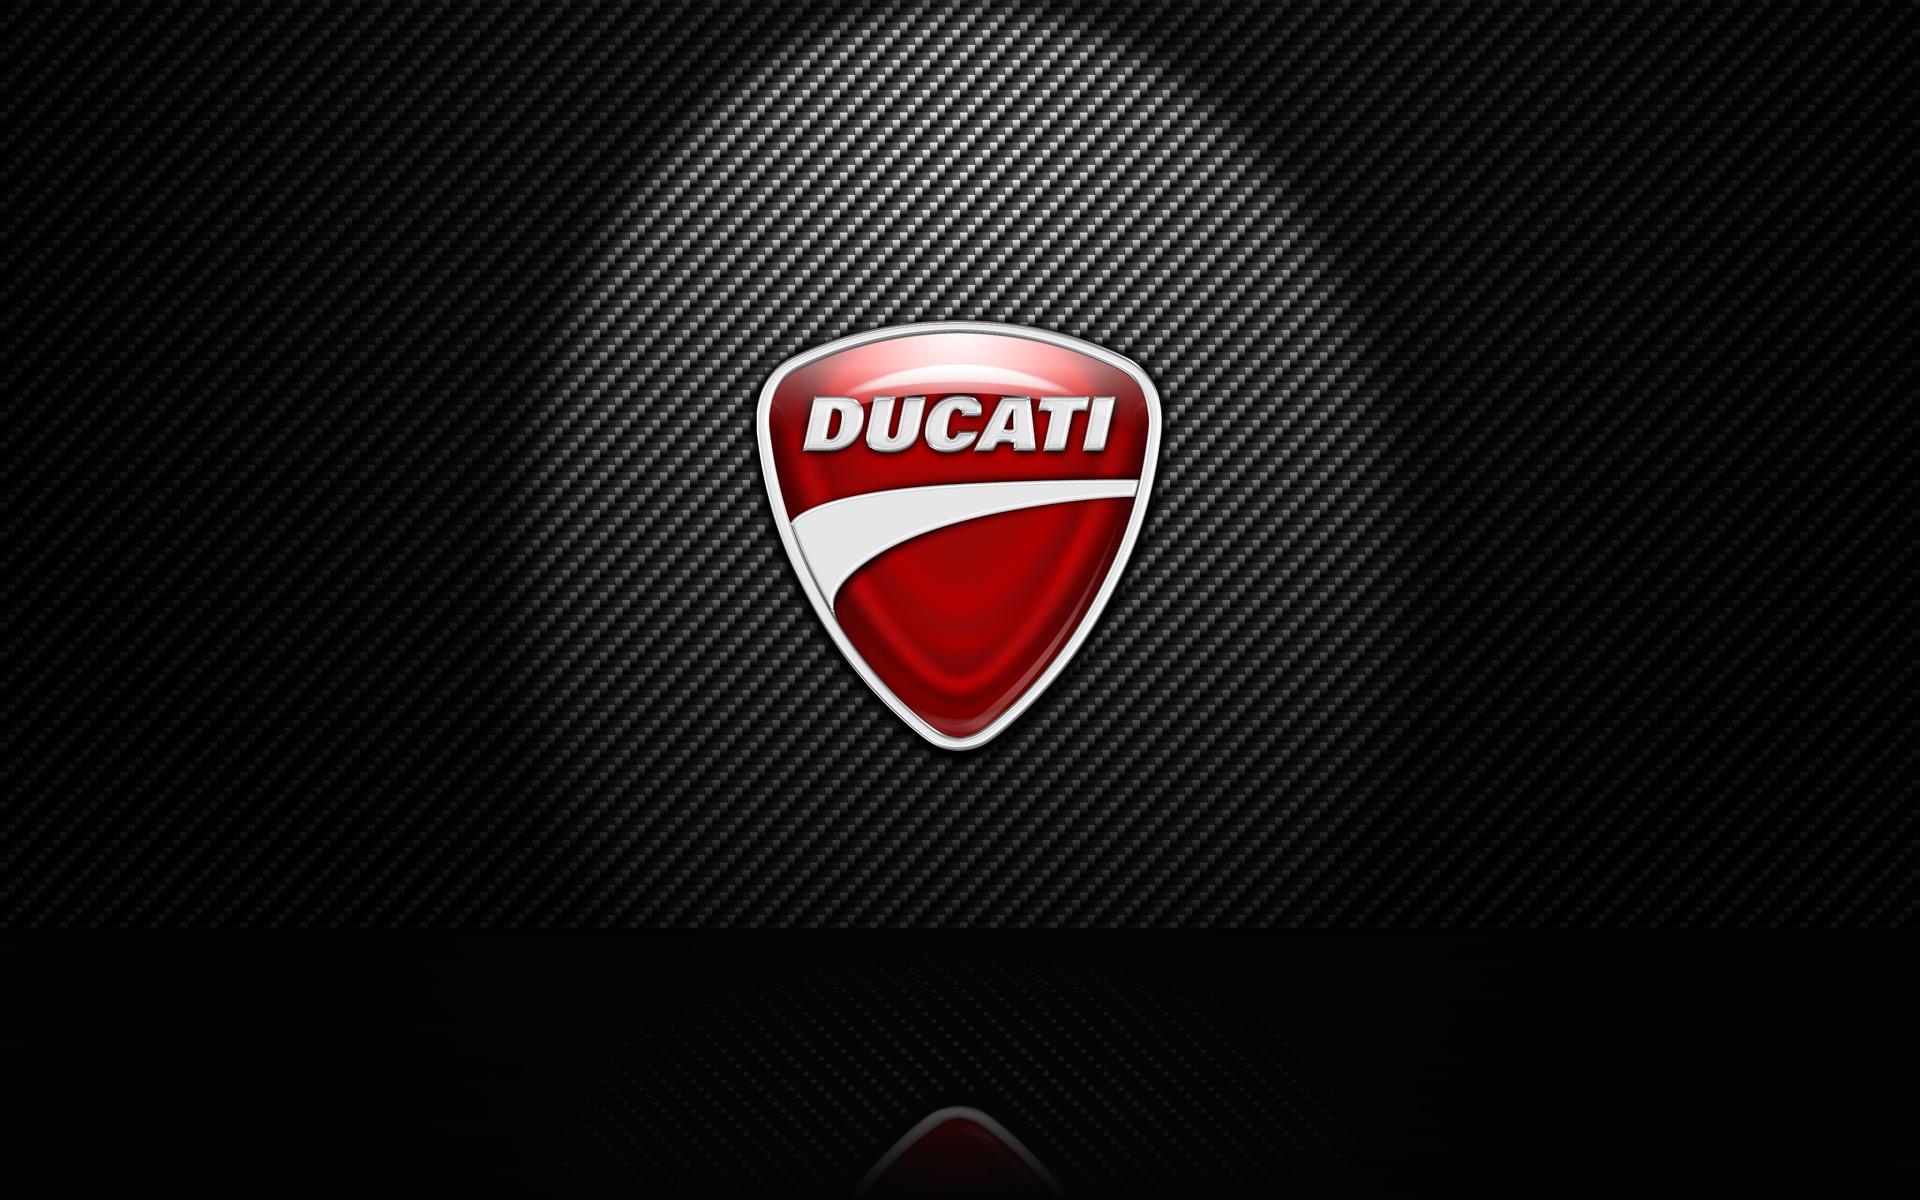 Ducati Background